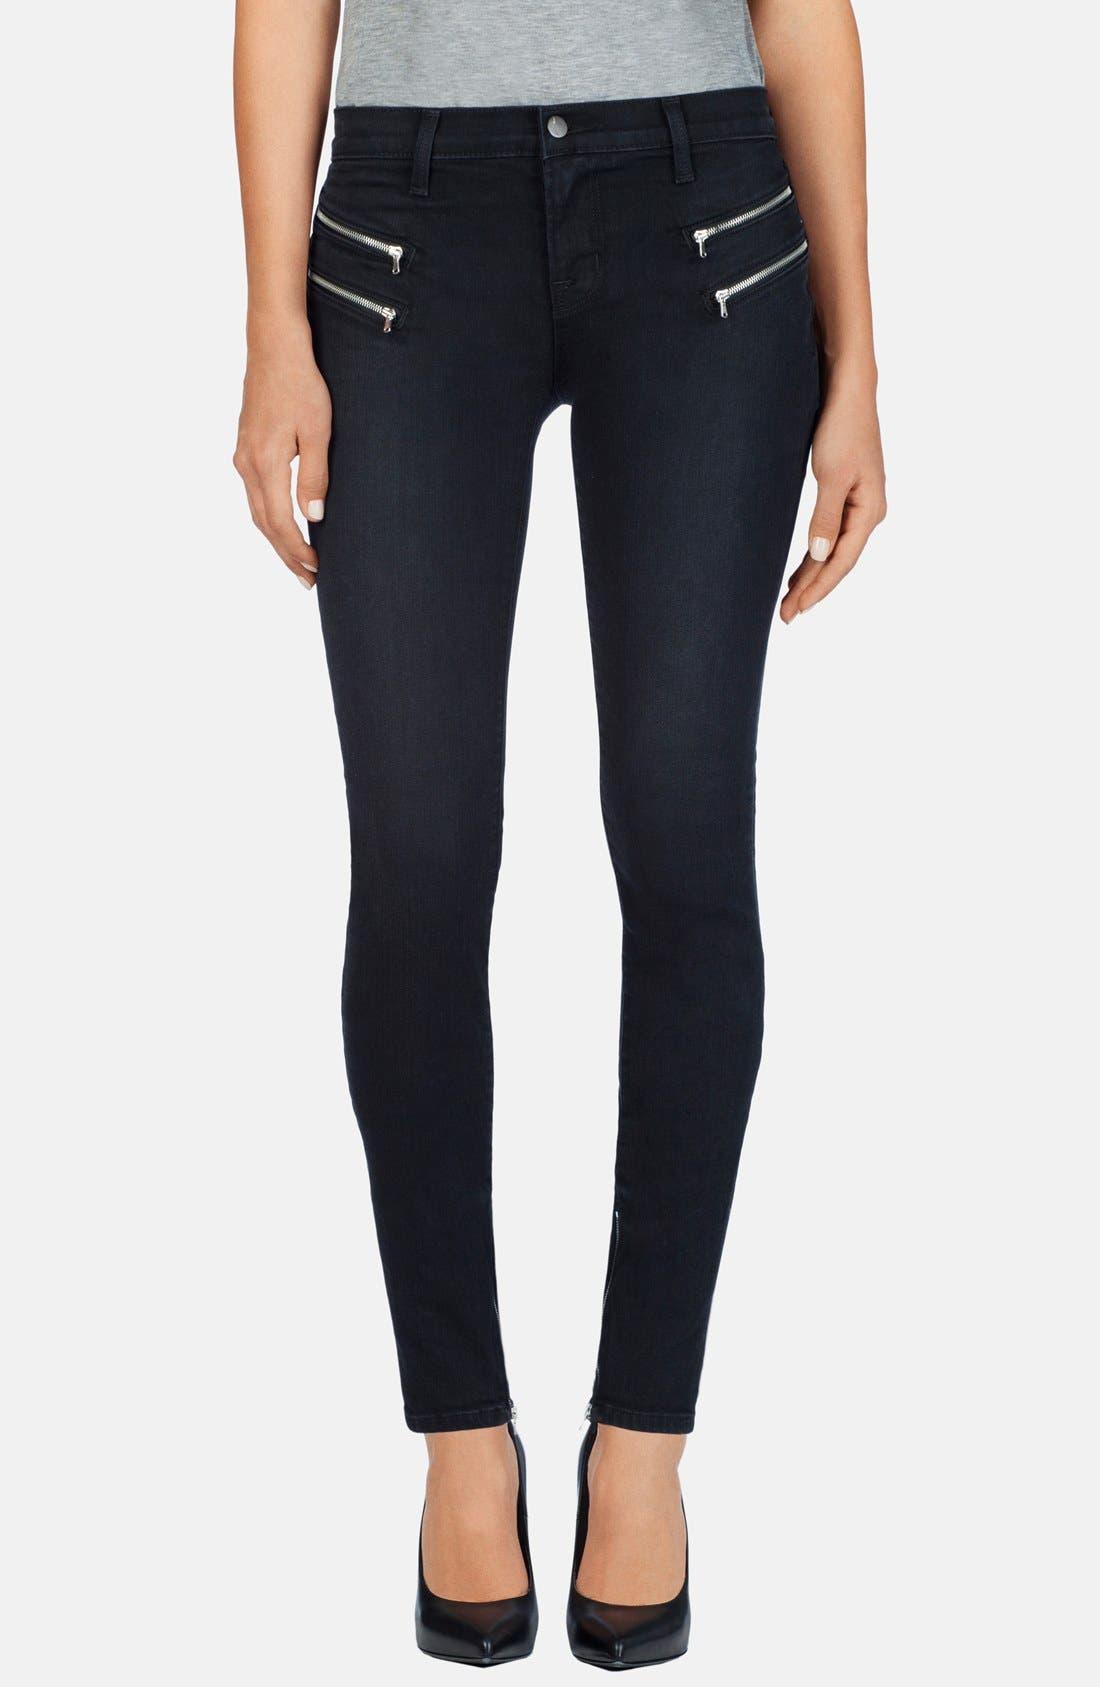 Alternate Image 1 Selected - J Brand 'Cass' Zip Skinny Jeans (Digital)